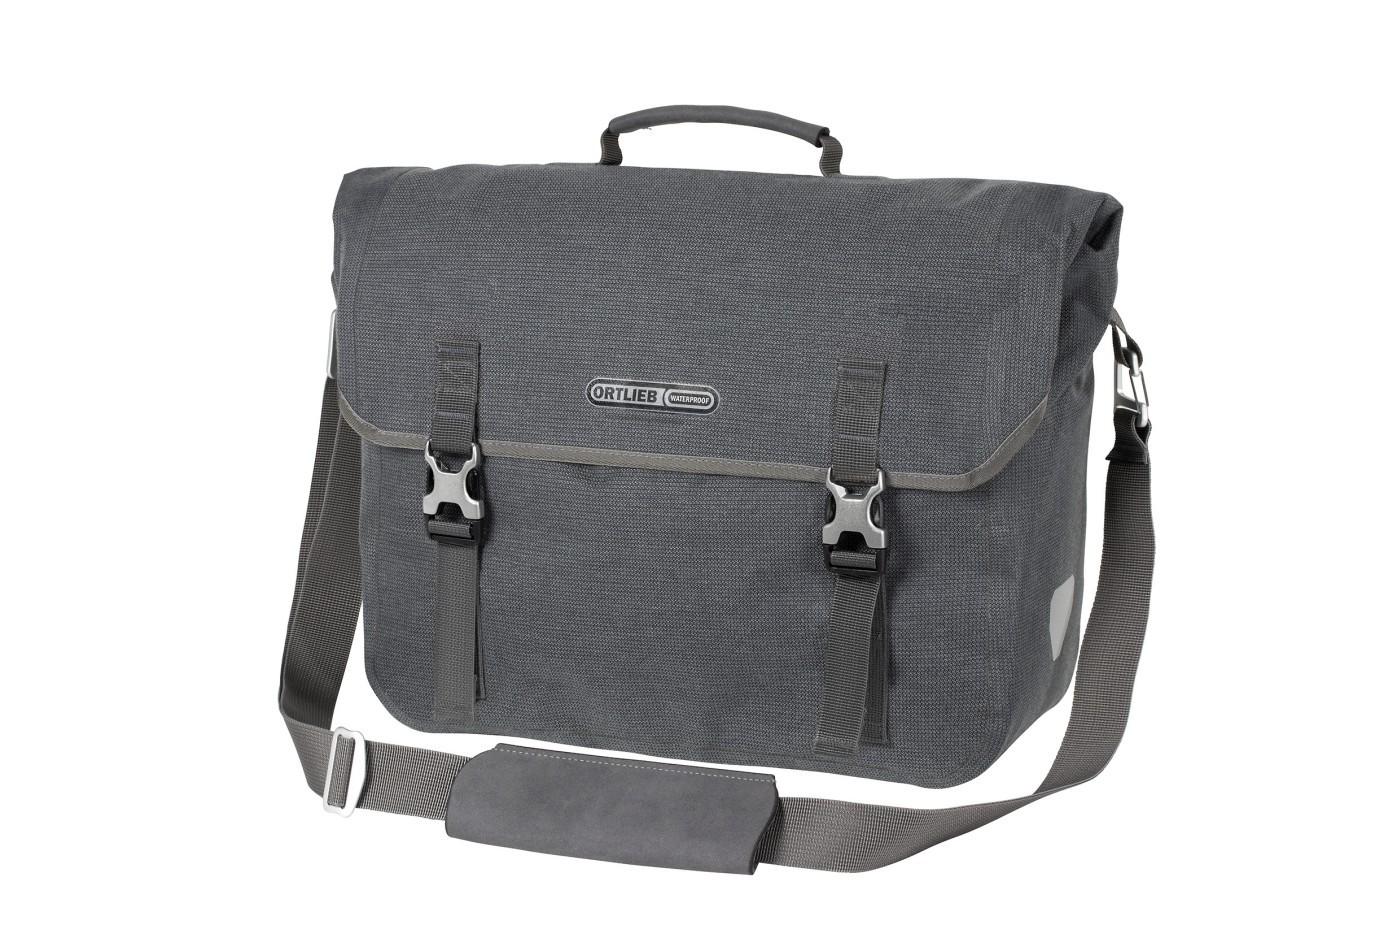 Ortlieb Commuter-Bag Two Urban - QL2.1